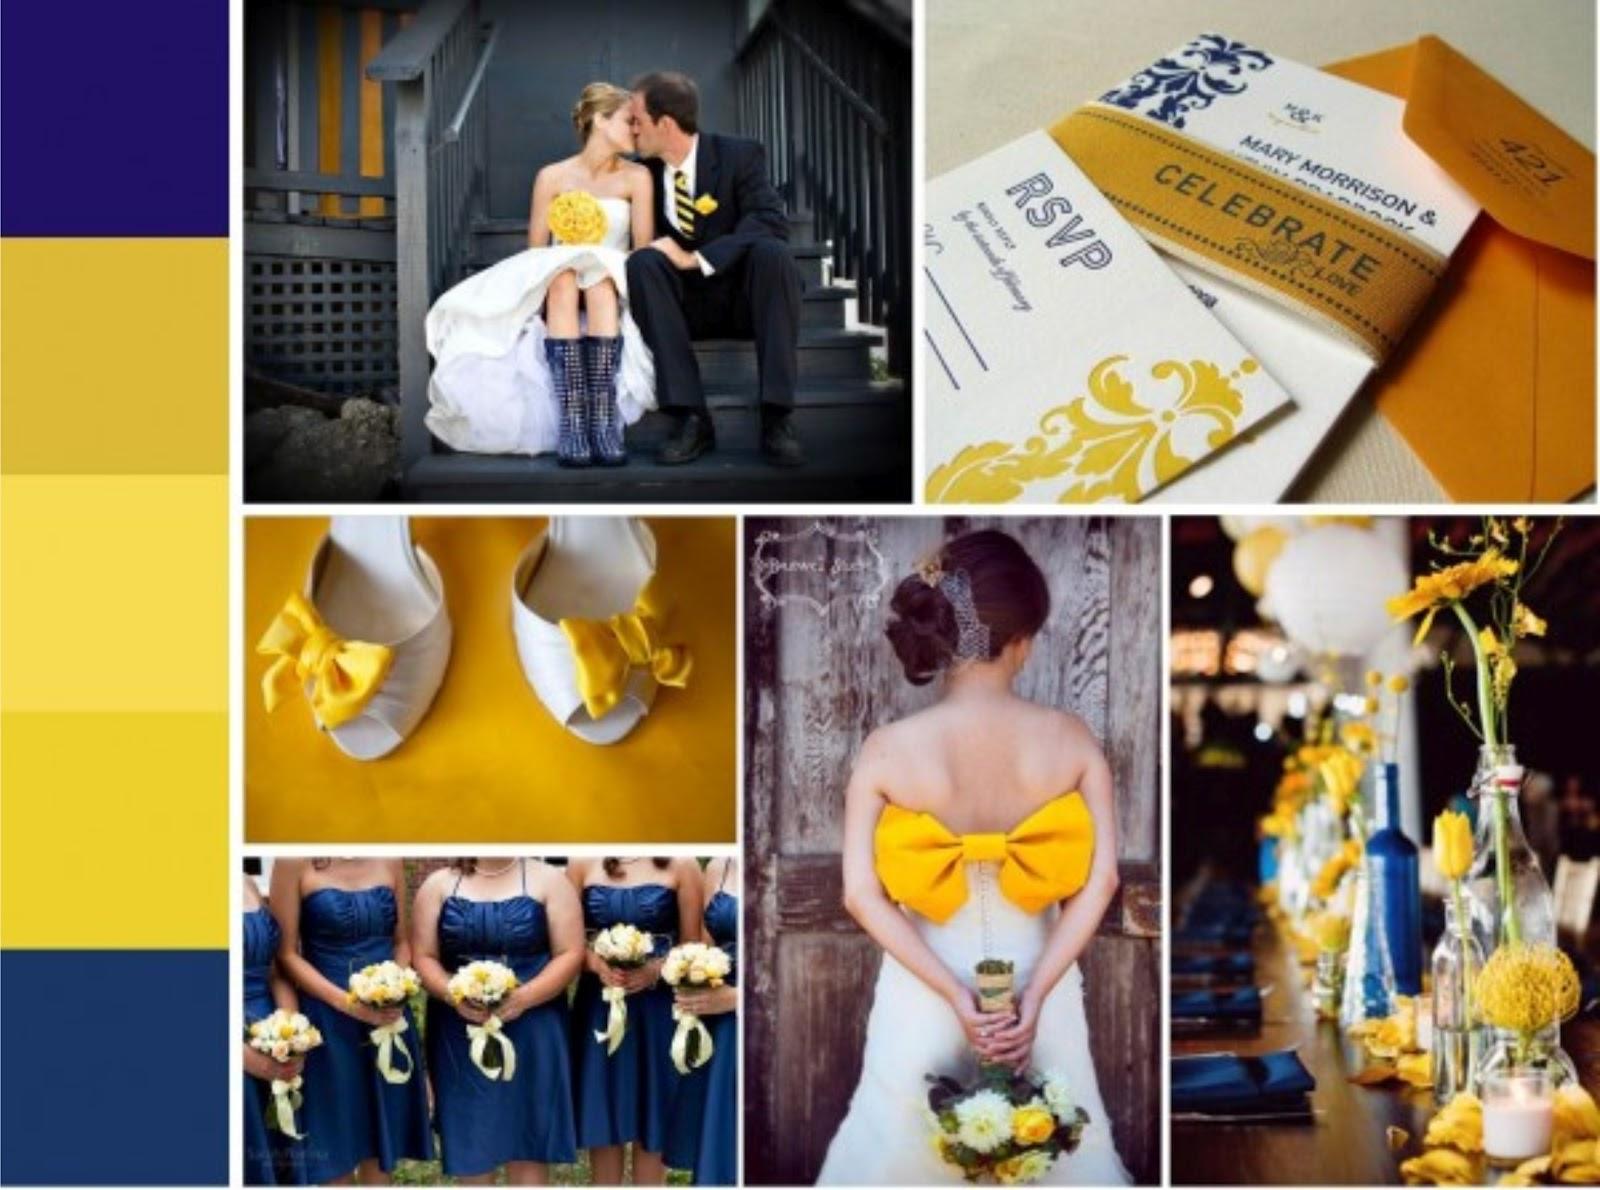 decoracao de casamento azul escuro e amarelo : decoracao de casamento azul escuro e amarelo:deCORação casamento – amarelo e combinações